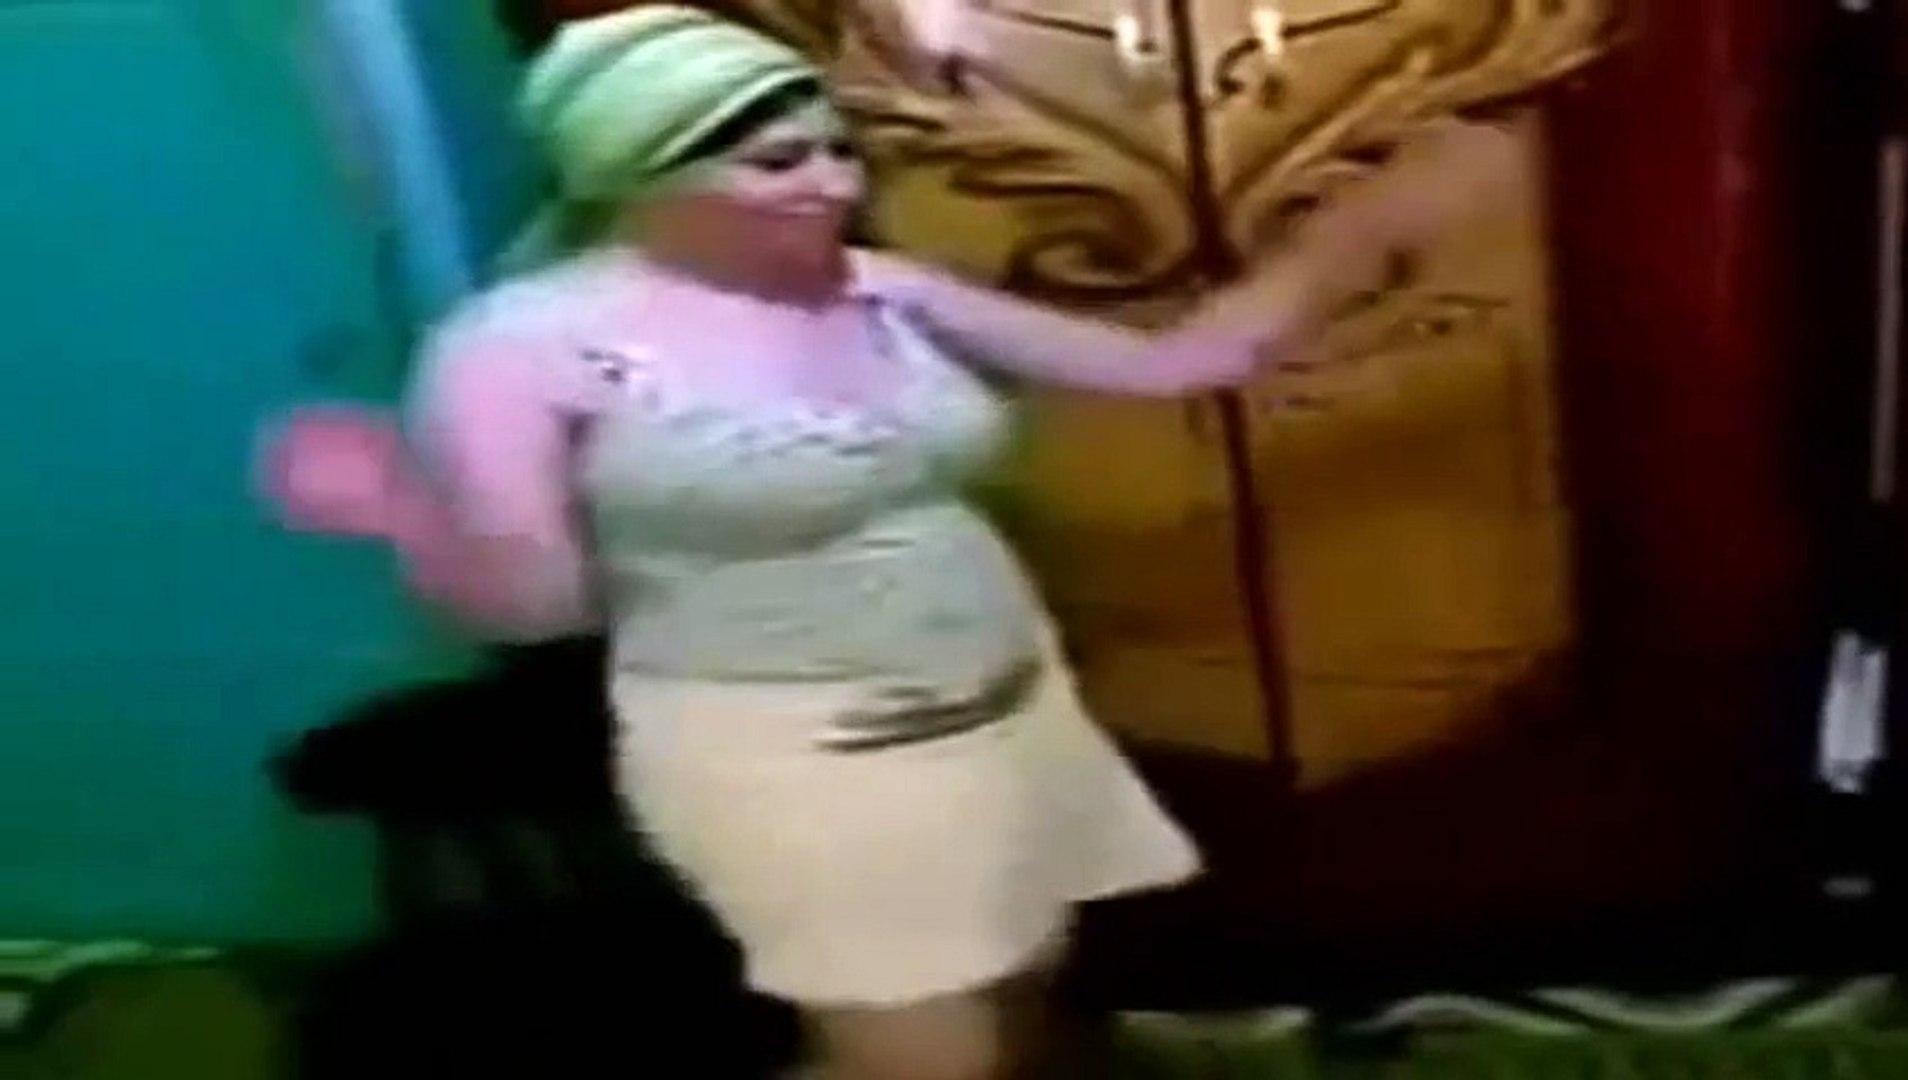 رقص مصري جديد فيديو رقص شرقي عربي مقاطع منزلى جديده